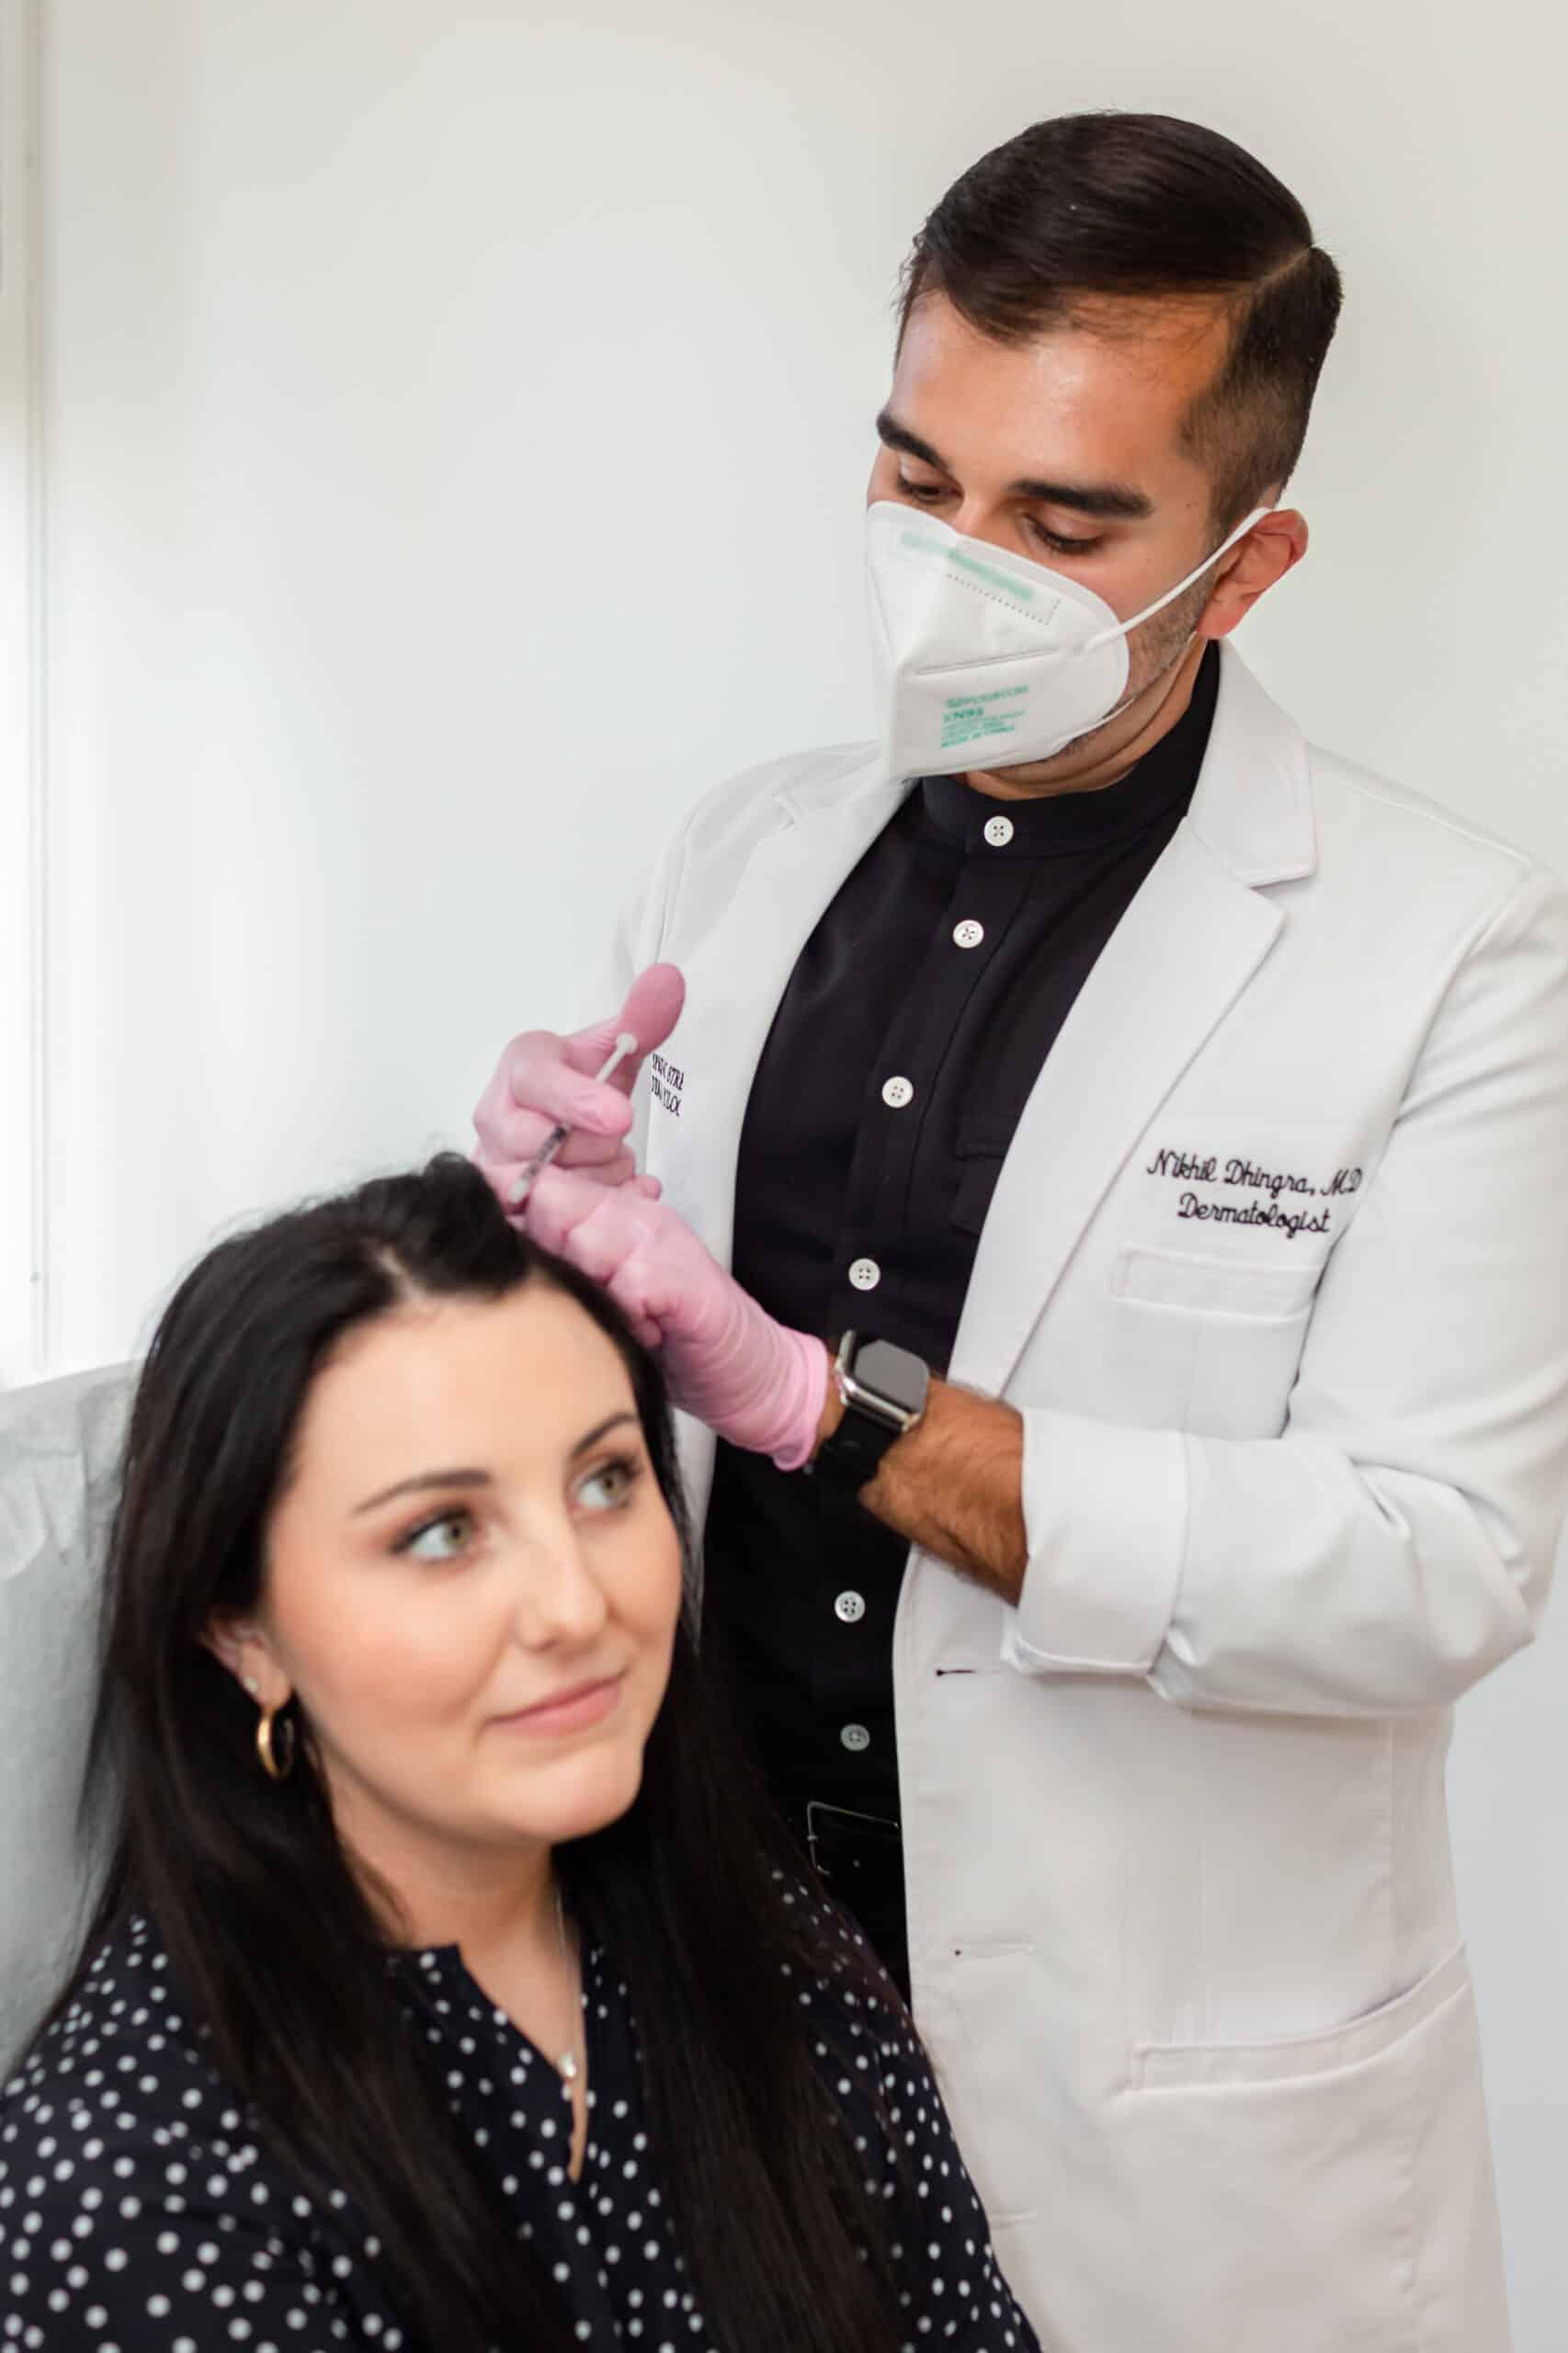 NYC dermatologist, Dr. Nikhil Dhingra